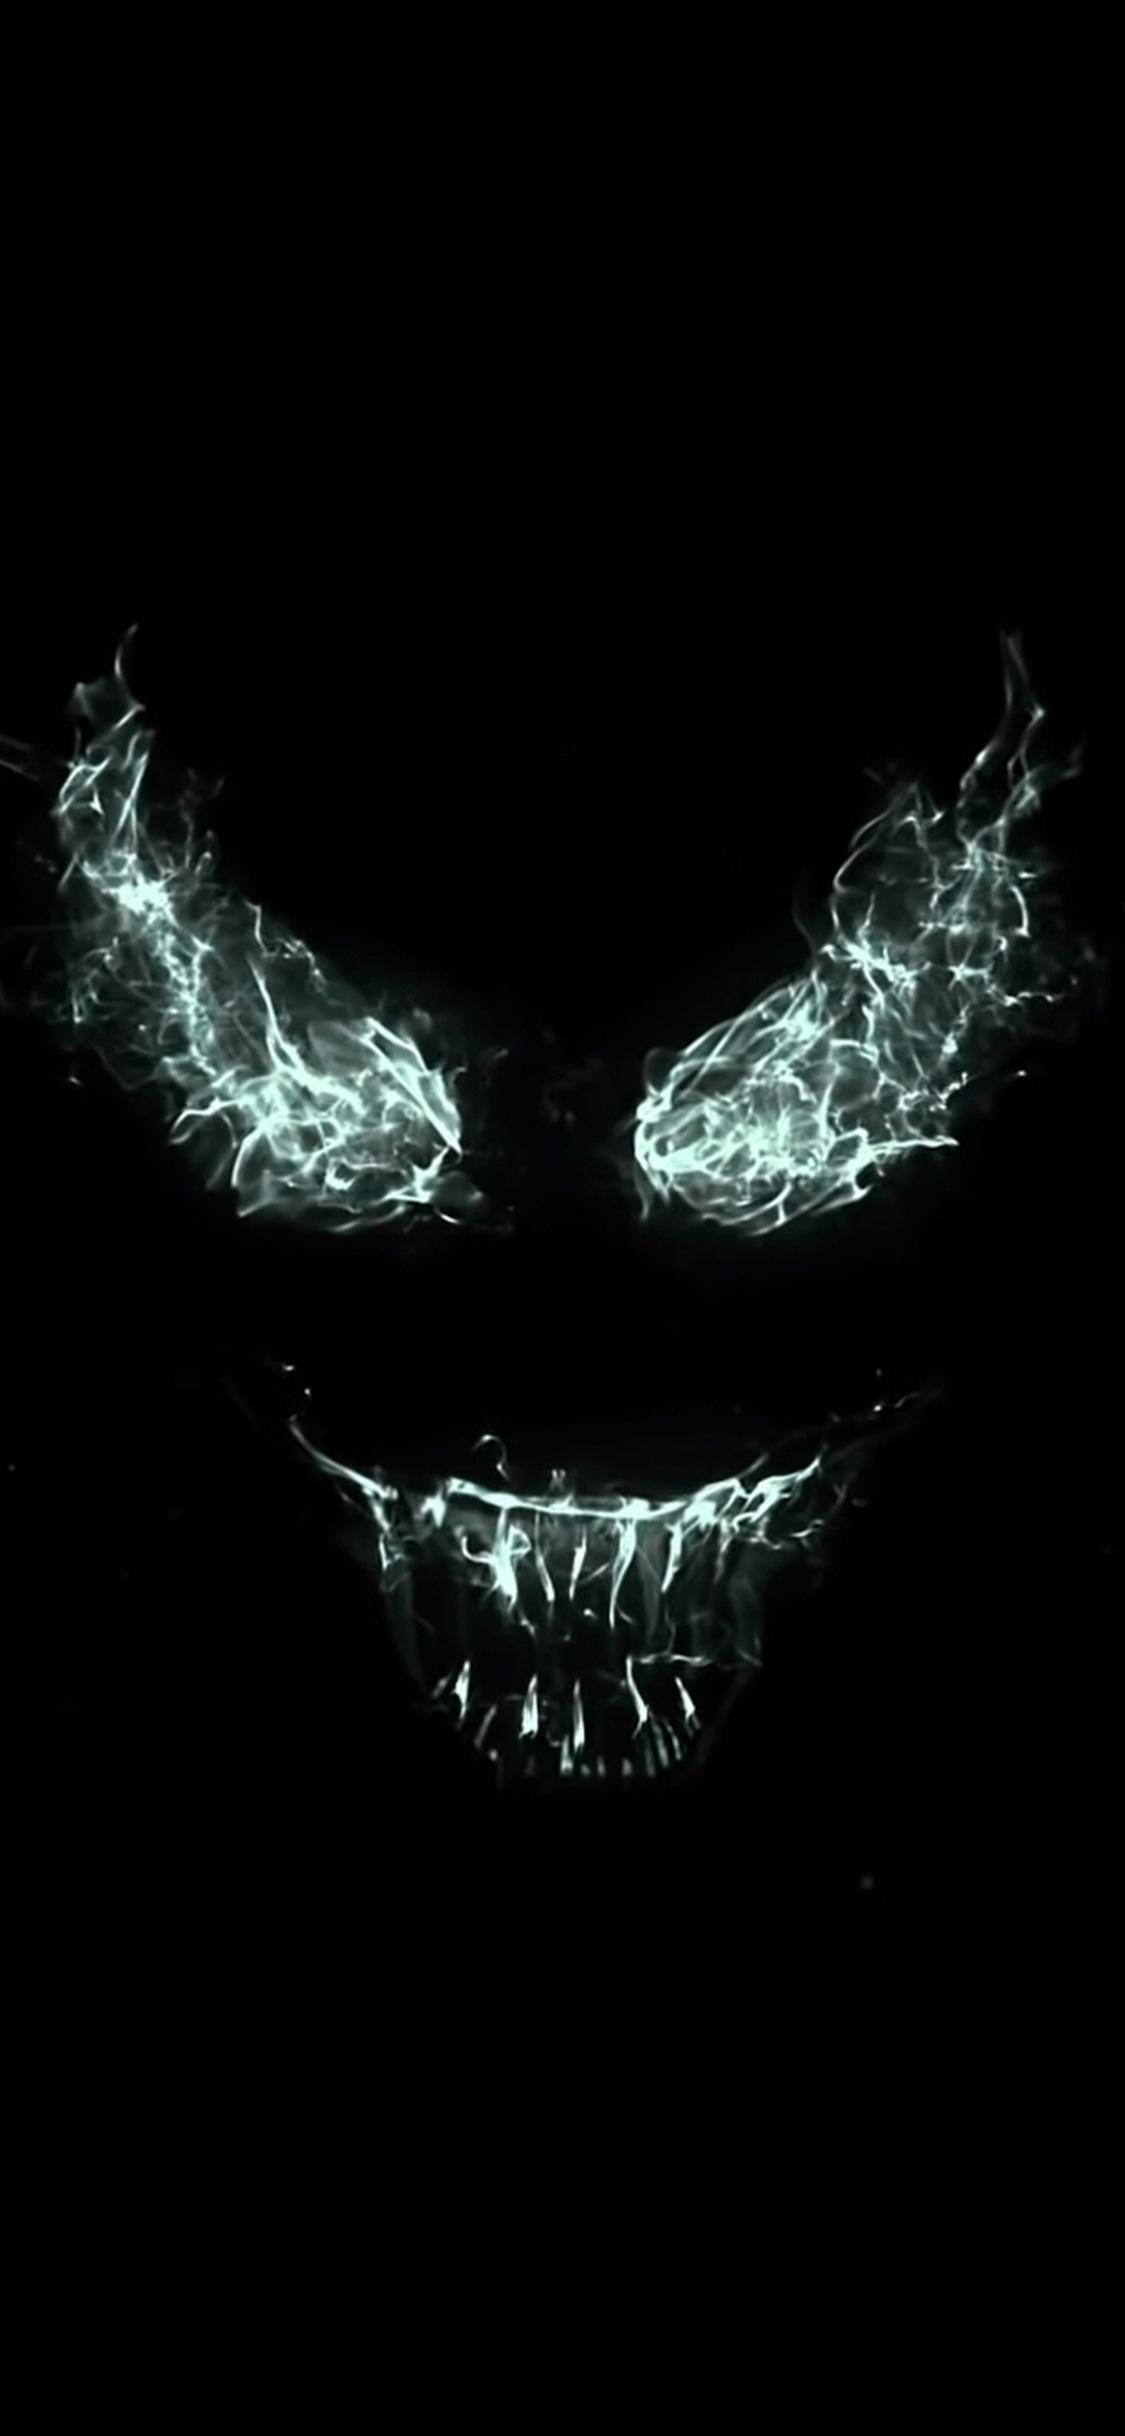 iPhone wallpaper venom movie Venom